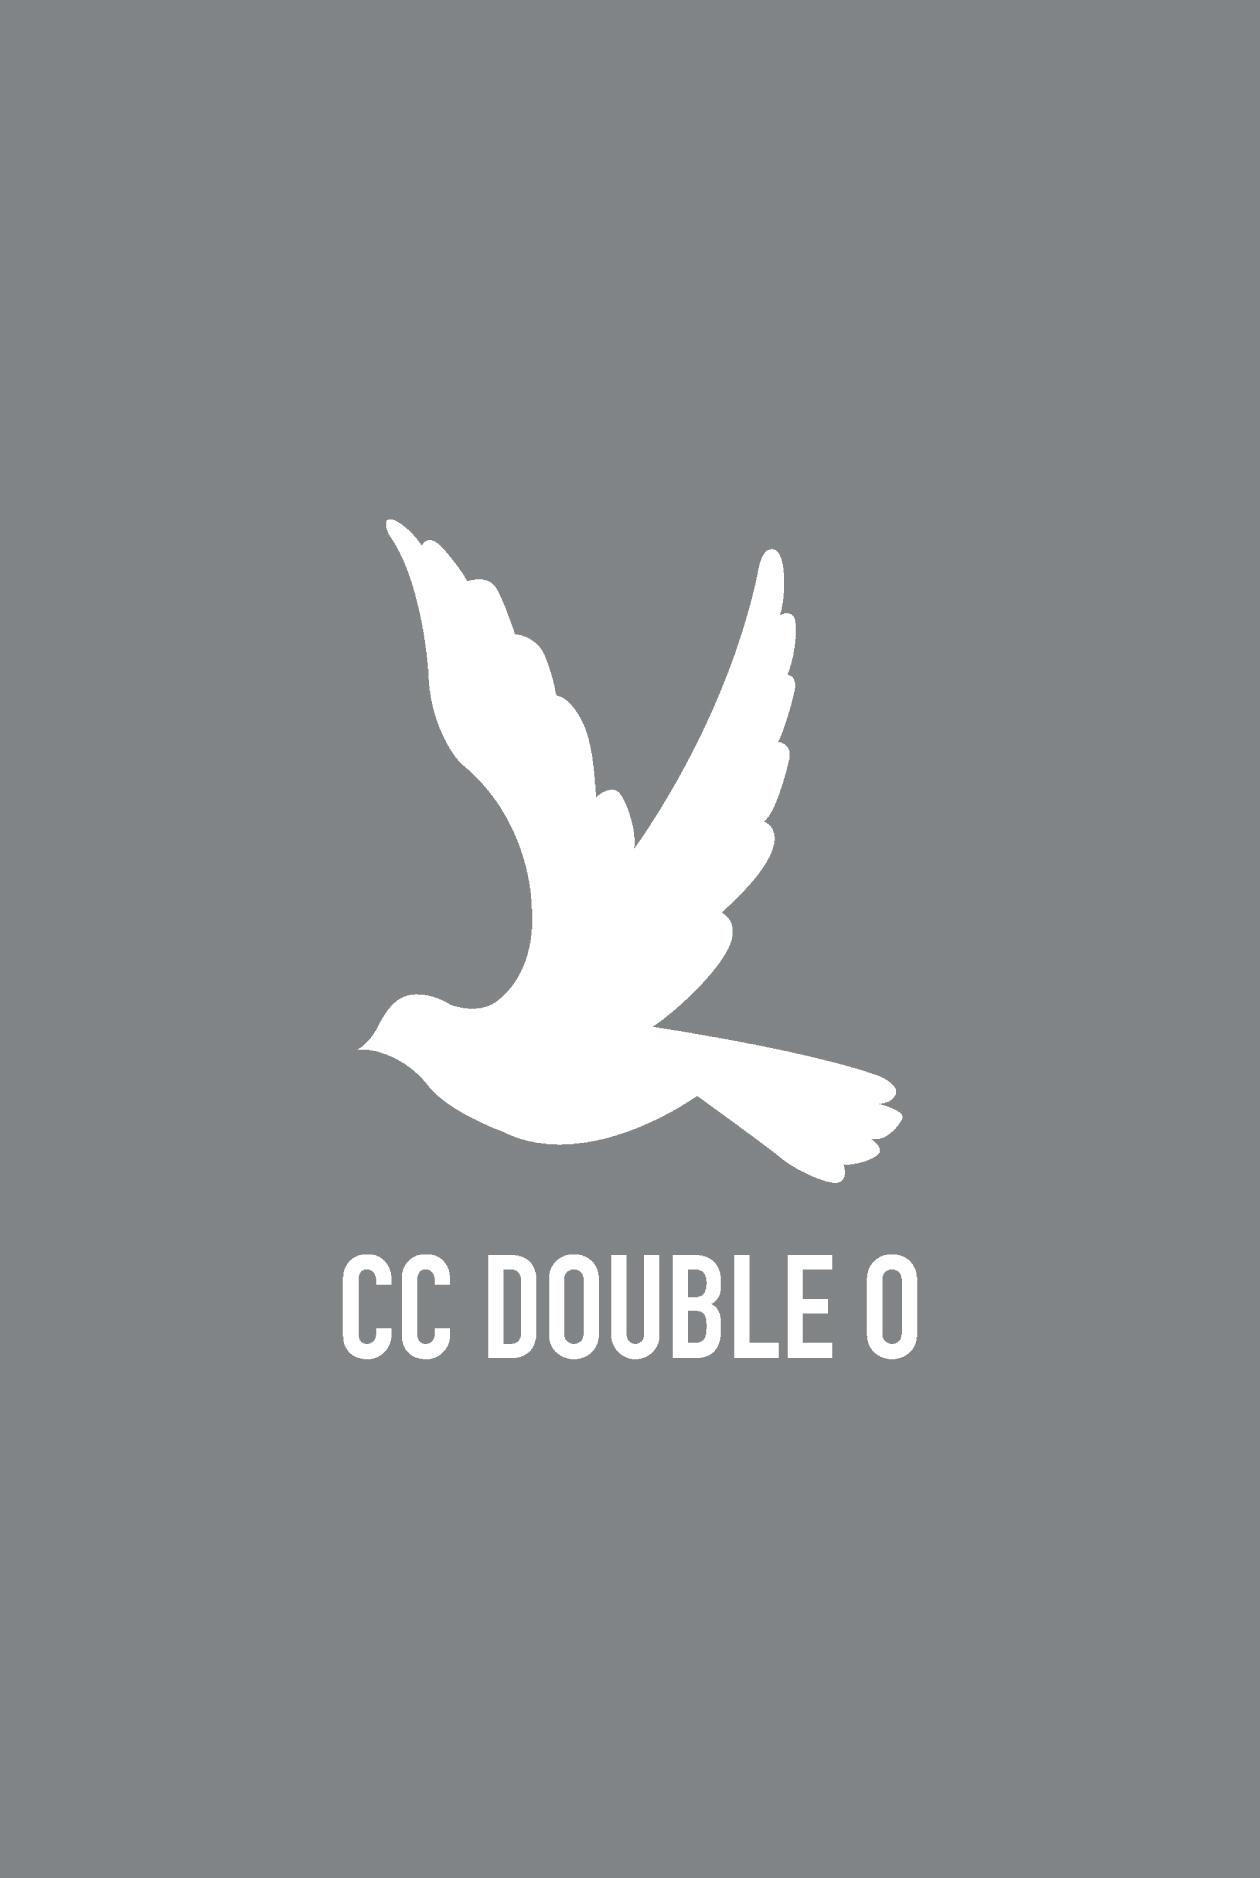 CC DOUBLE O Printed Flip Flopss